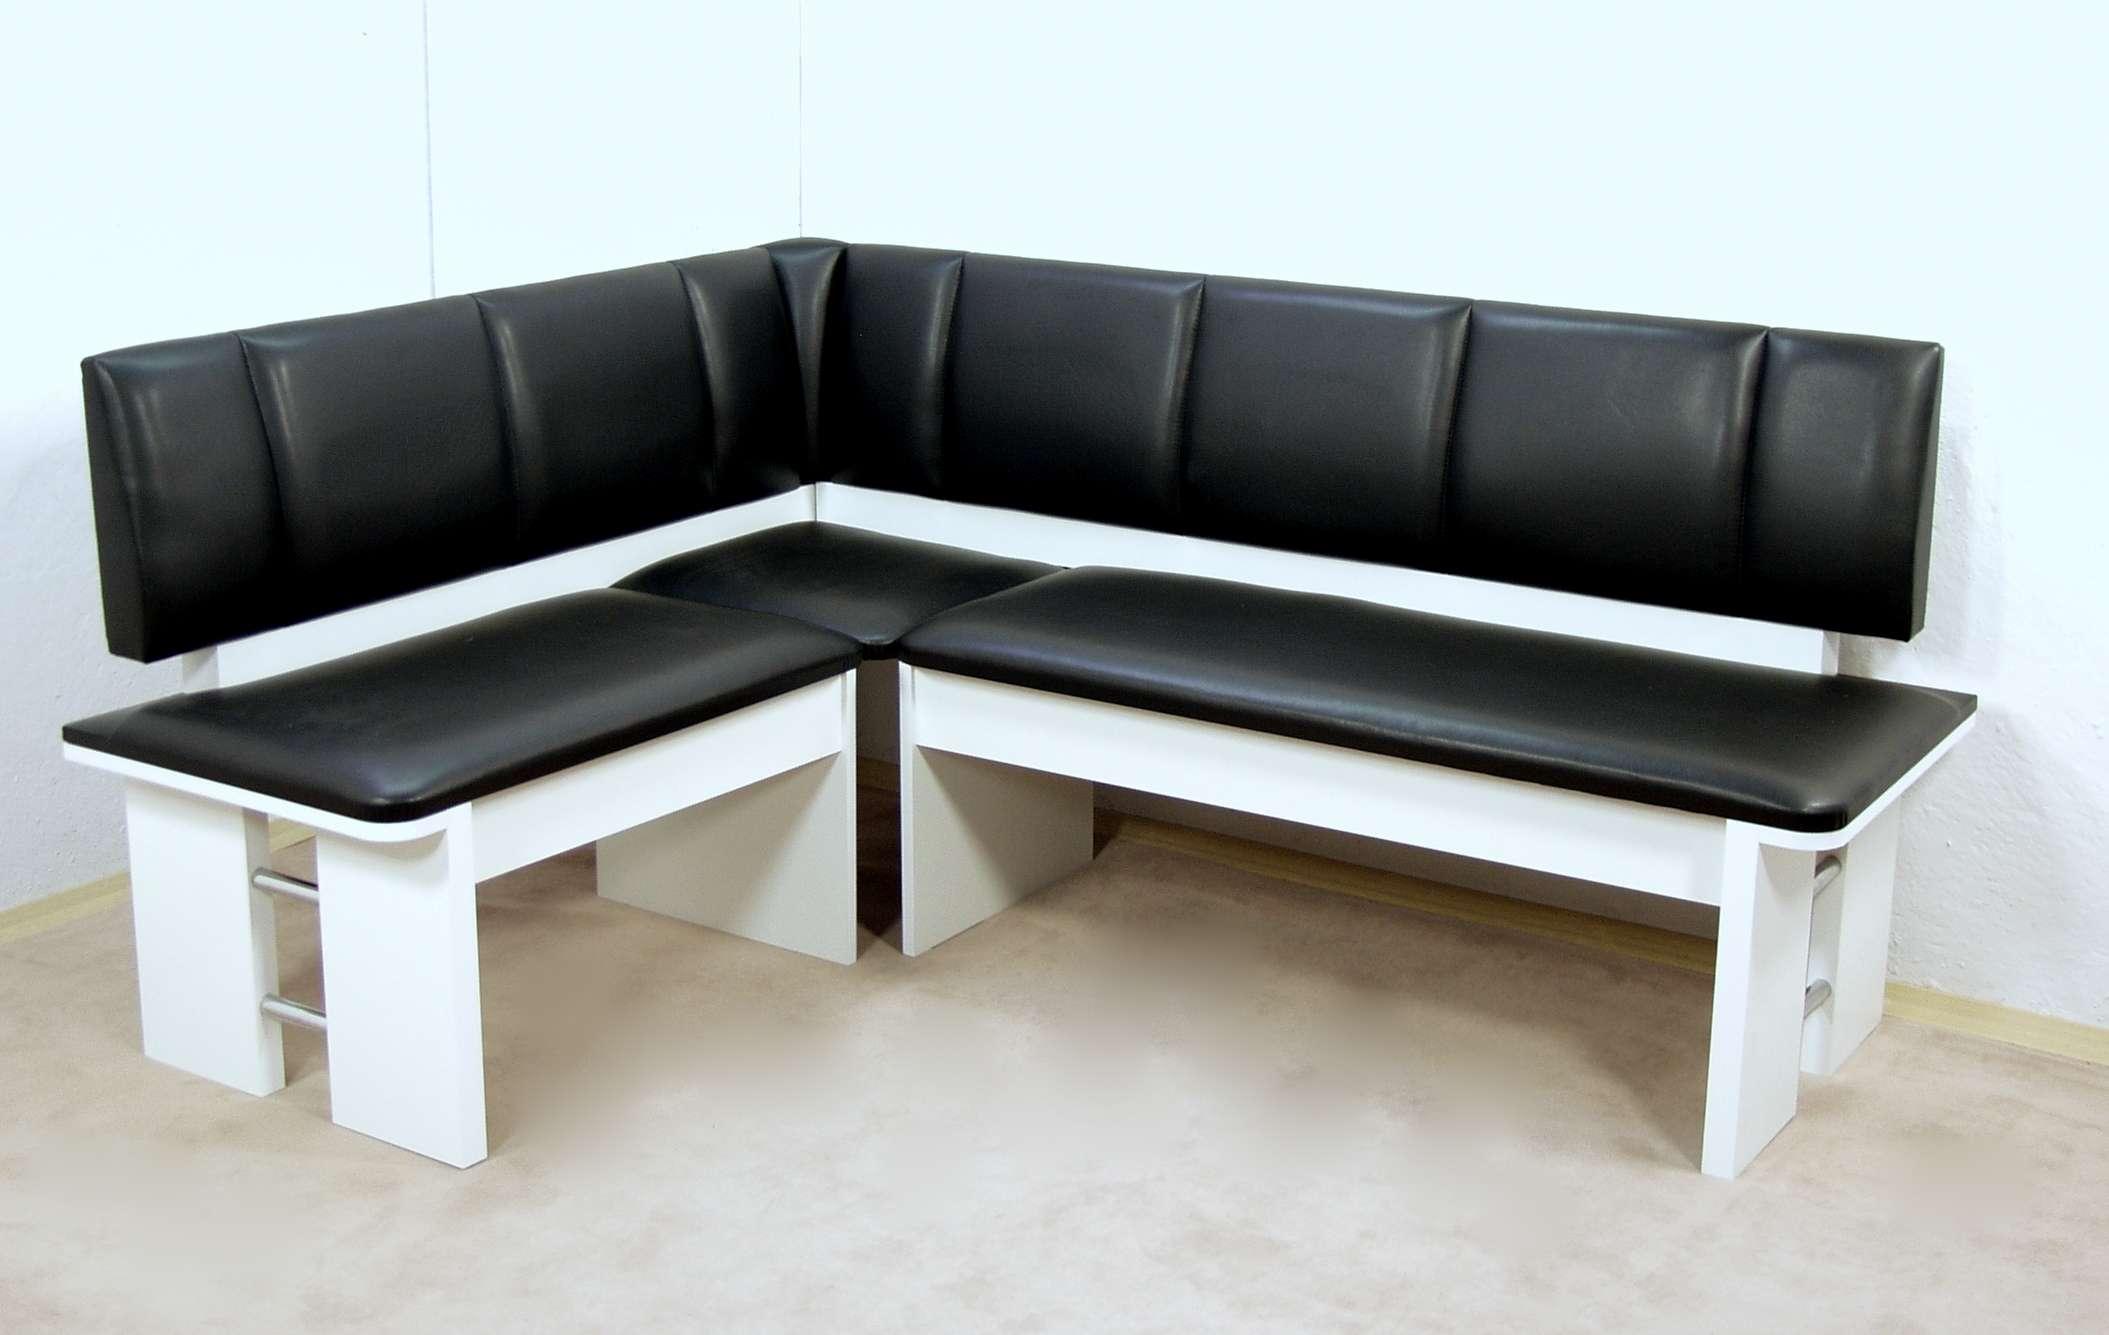 moderne eckbank weiss sitzecke esszimmer k che melamin design hochwertig neu ebay. Black Bedroom Furniture Sets. Home Design Ideas